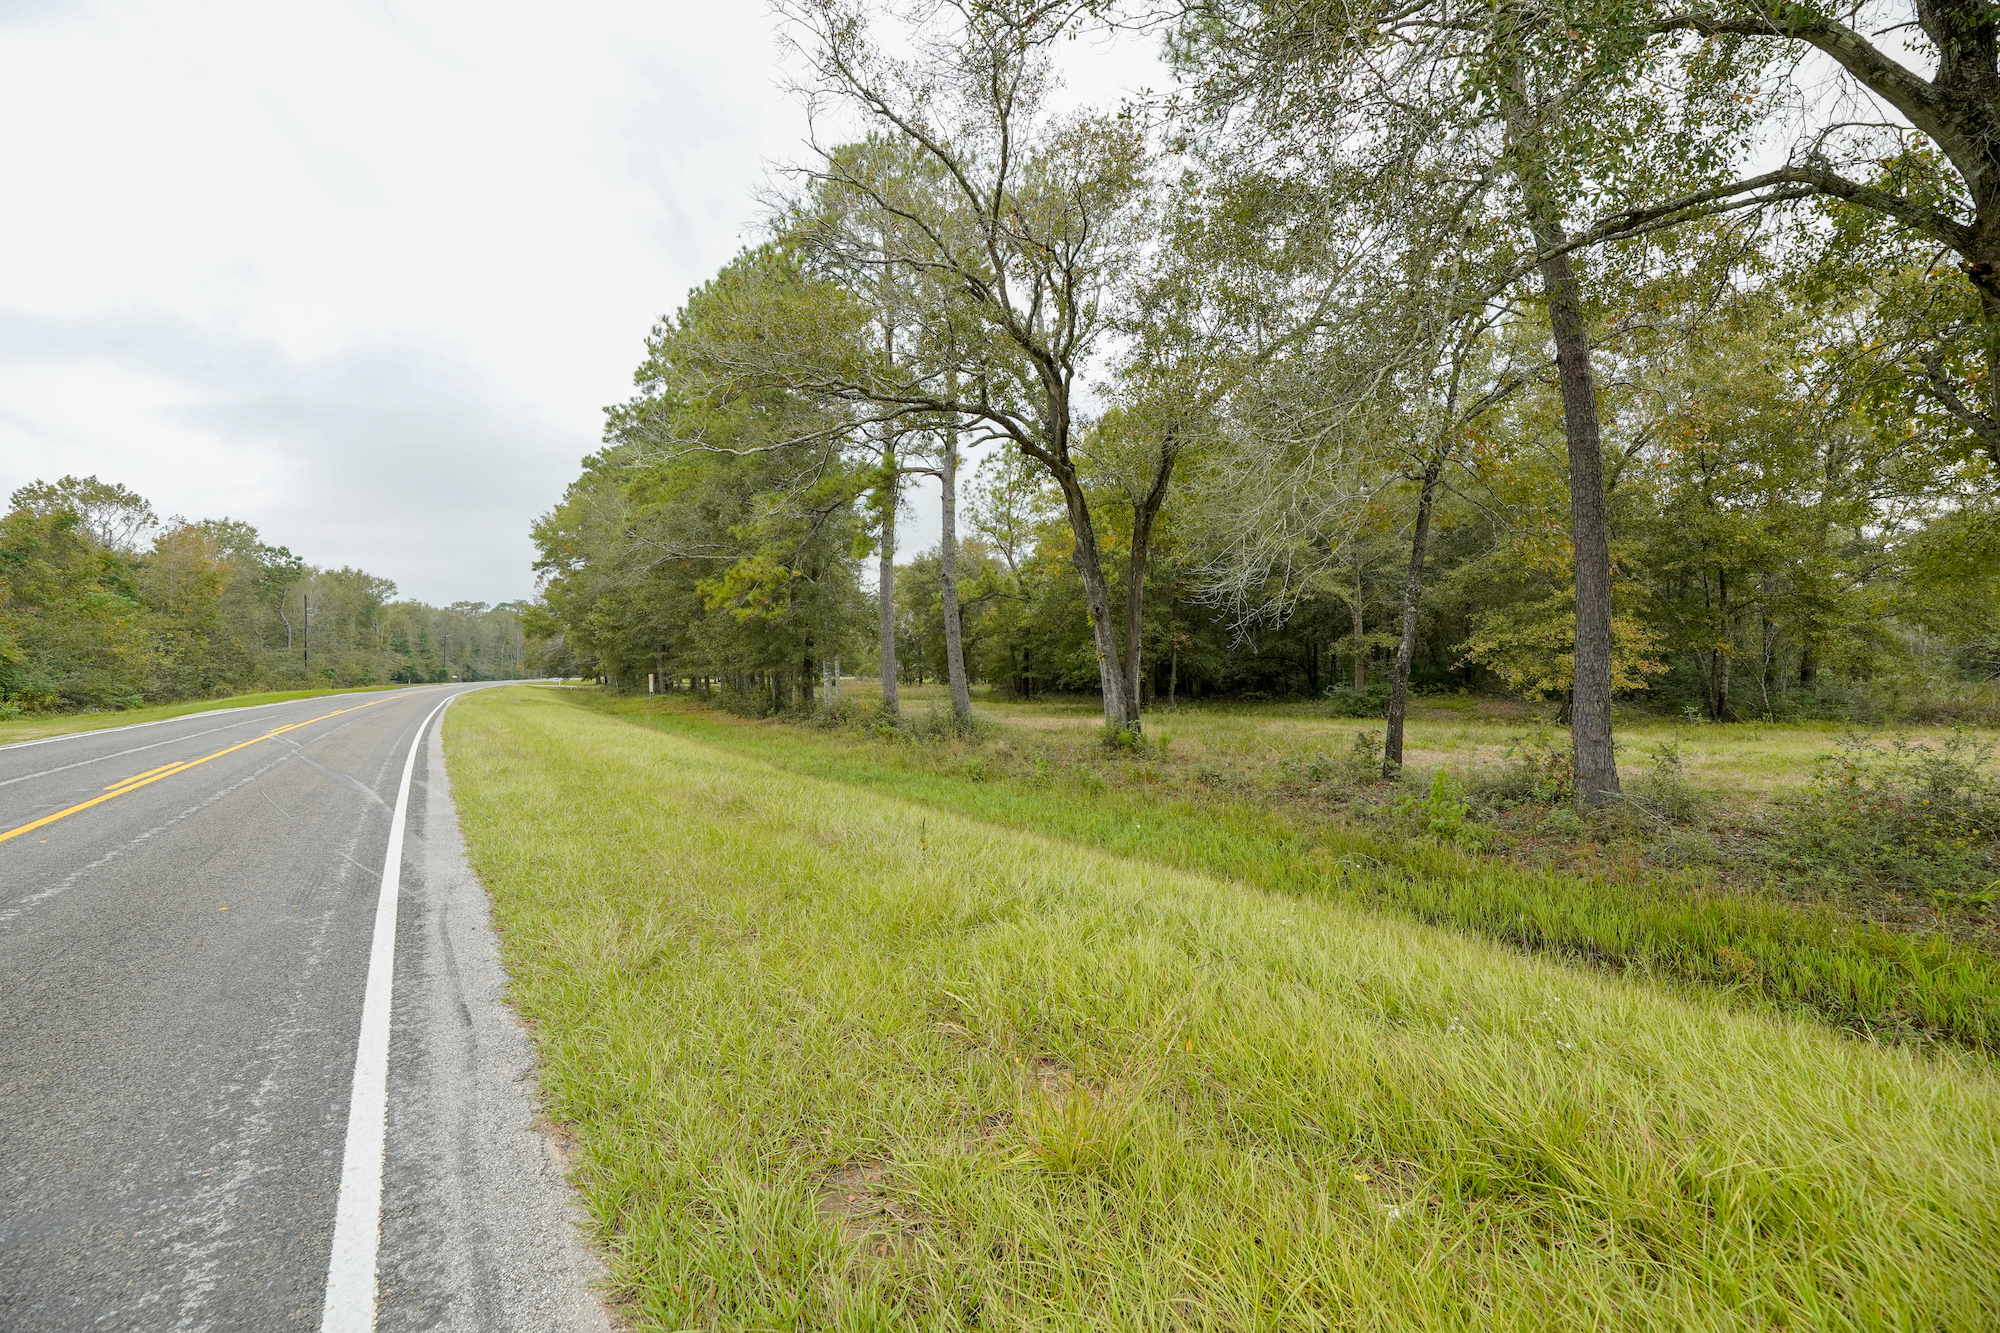 Jefferson County Development Land - Image 31 of 36